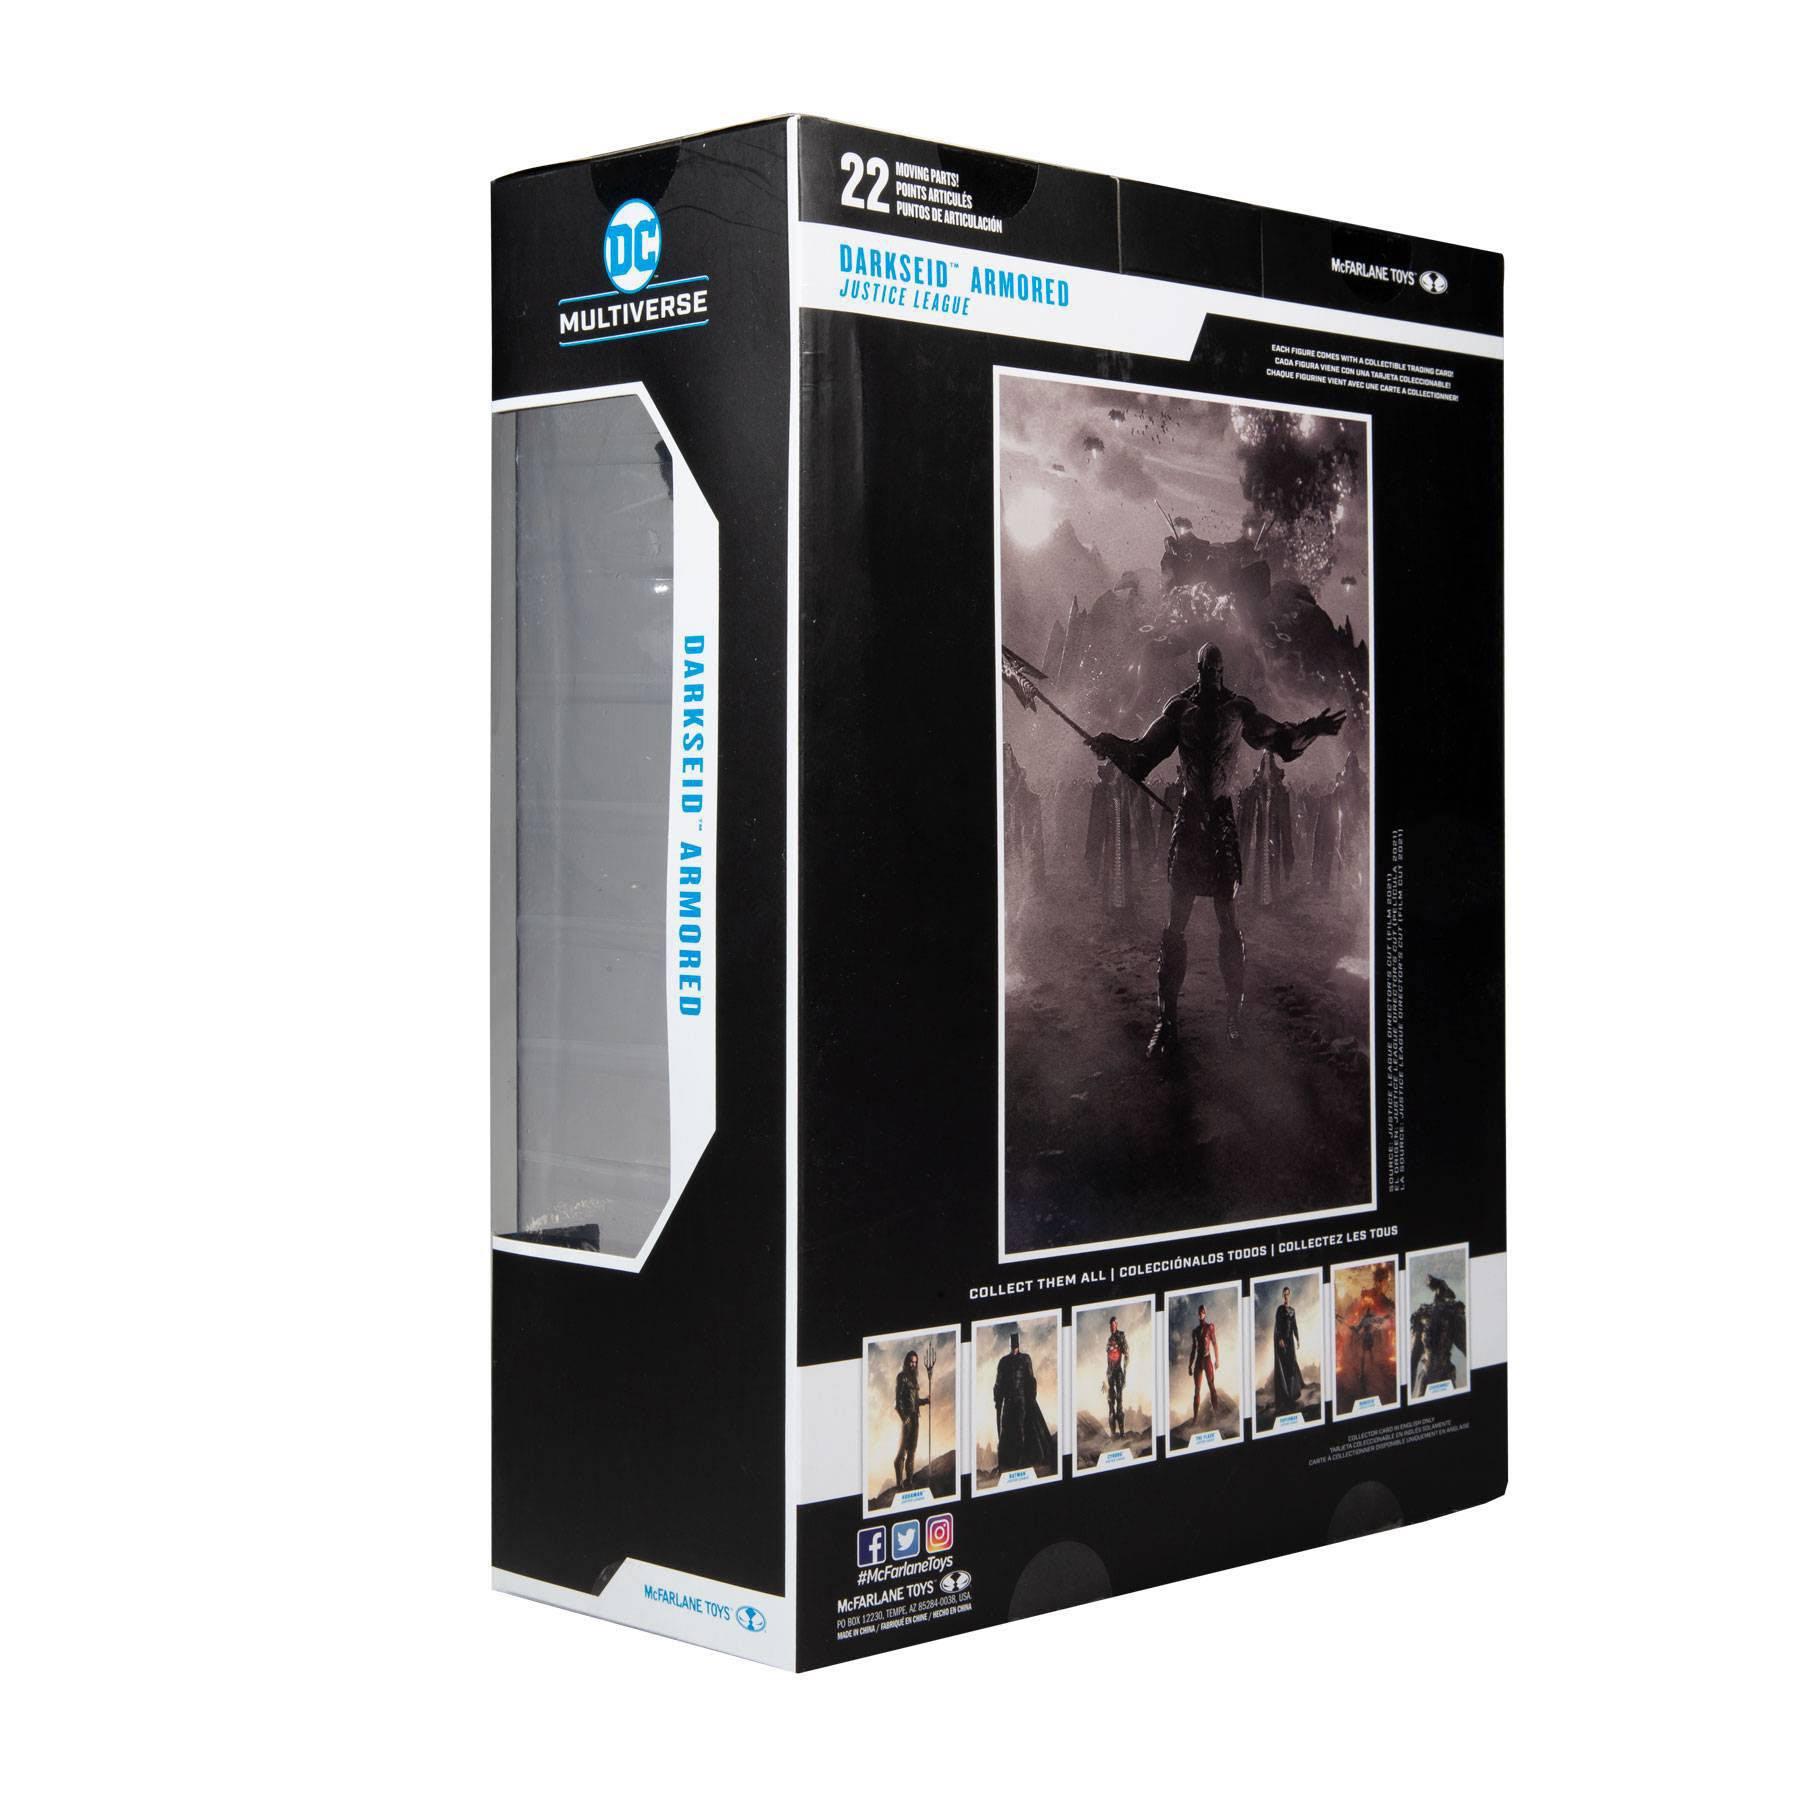 DC Justice League Movie Actionfigur Darkseid Armored Justice League 30 cm MCF15089 787926150896